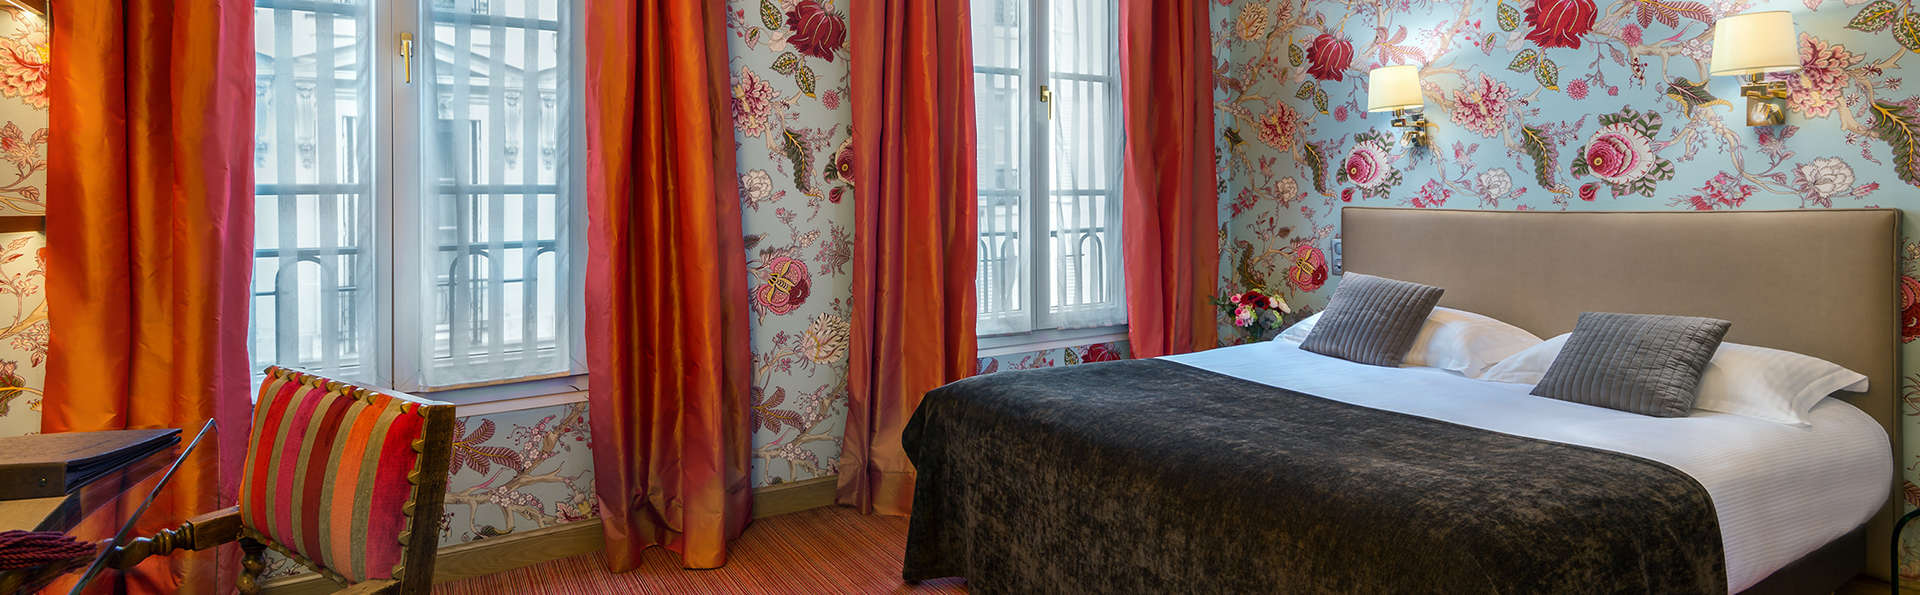 Hôtel Saint Paul Rive Gauche - EDIT_Hotel_Saint_Paul_Rive_Gauche___FR_6.jpg